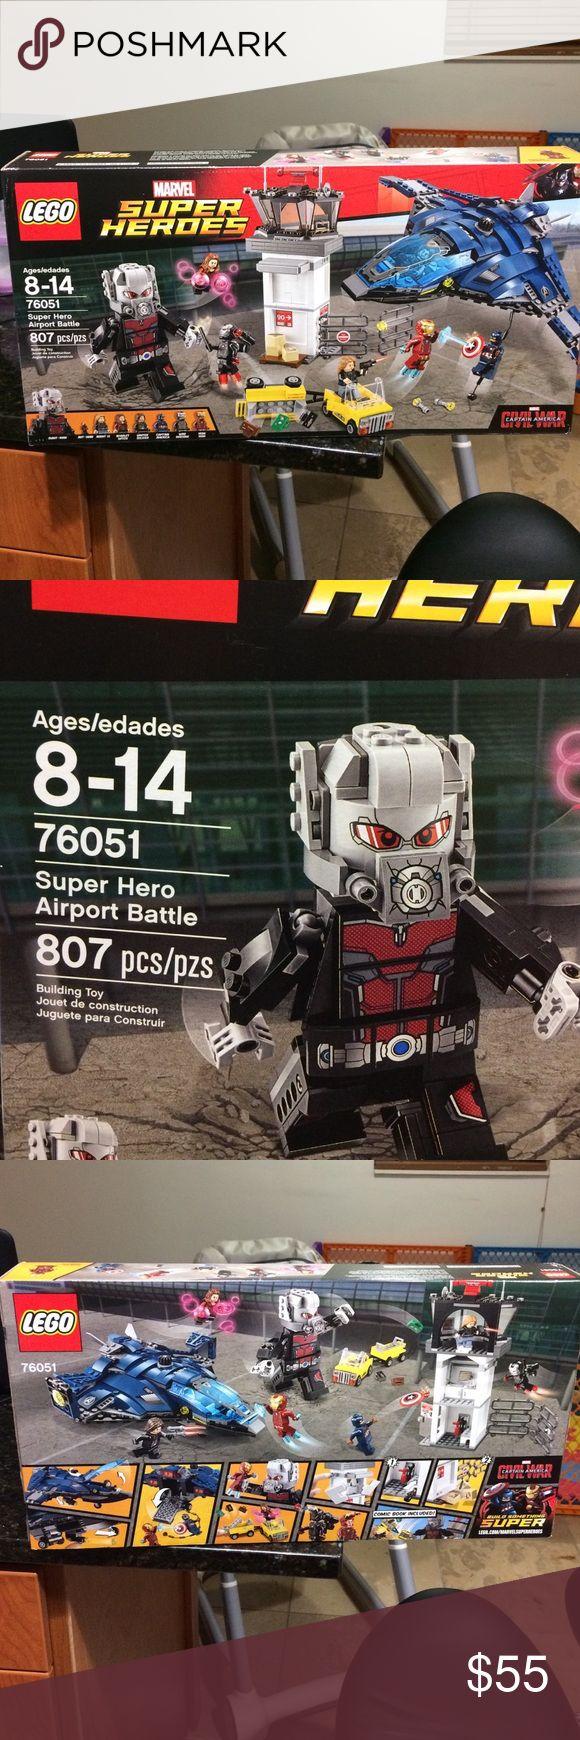 LEGO Super Heroes Super Hero Airport Battle 76051 LEGO Super Heroes Super Hero Airport Battle 76051 Lego Other